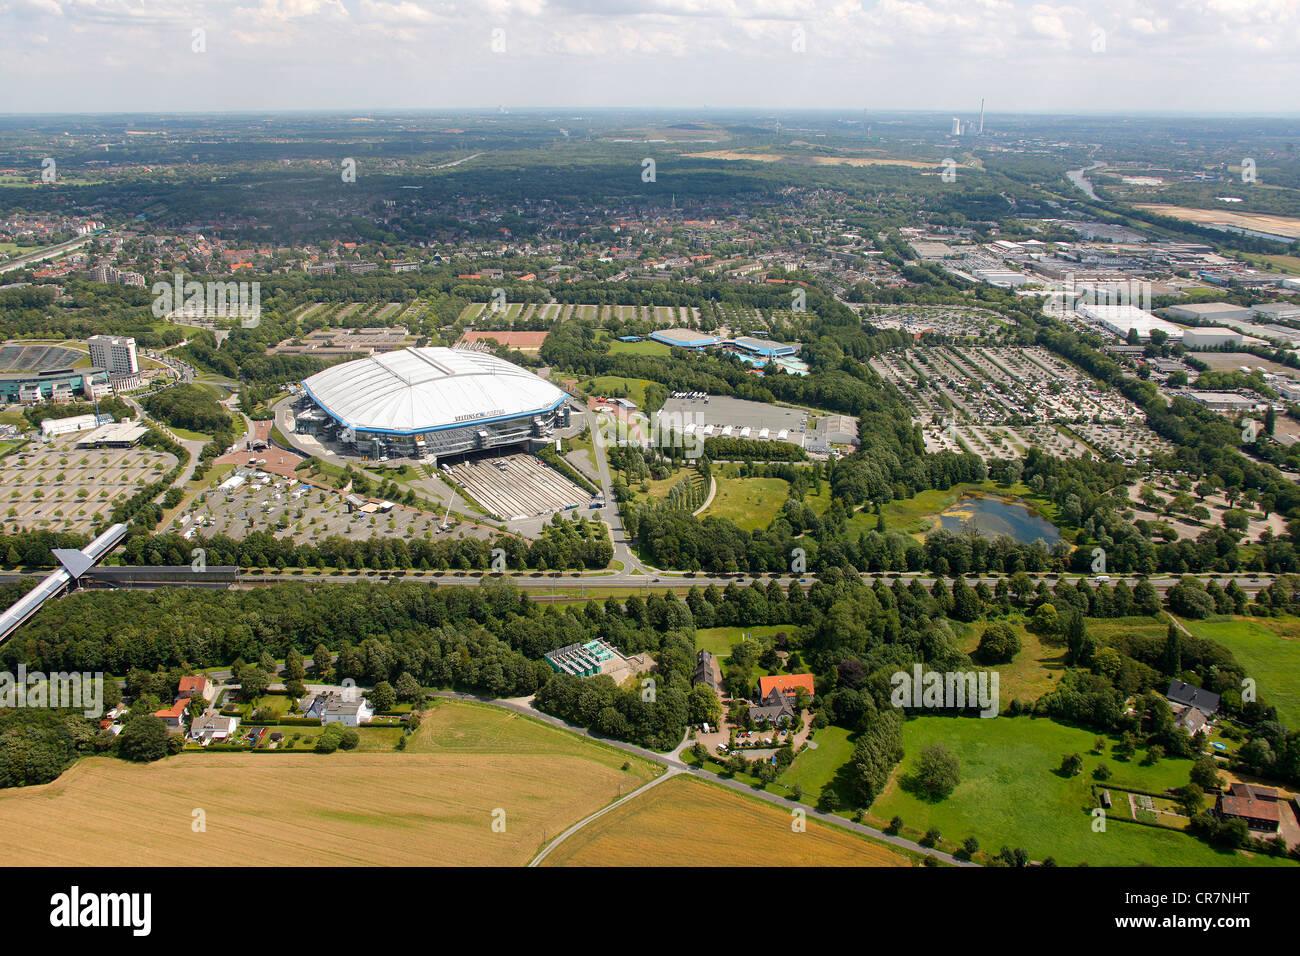 Aerial view, Schalke Arena, S04, football stadium, Gelsenkirchen, Ruhr Area, North Rhine-Westphalia, Germany, Europe - Stock Image